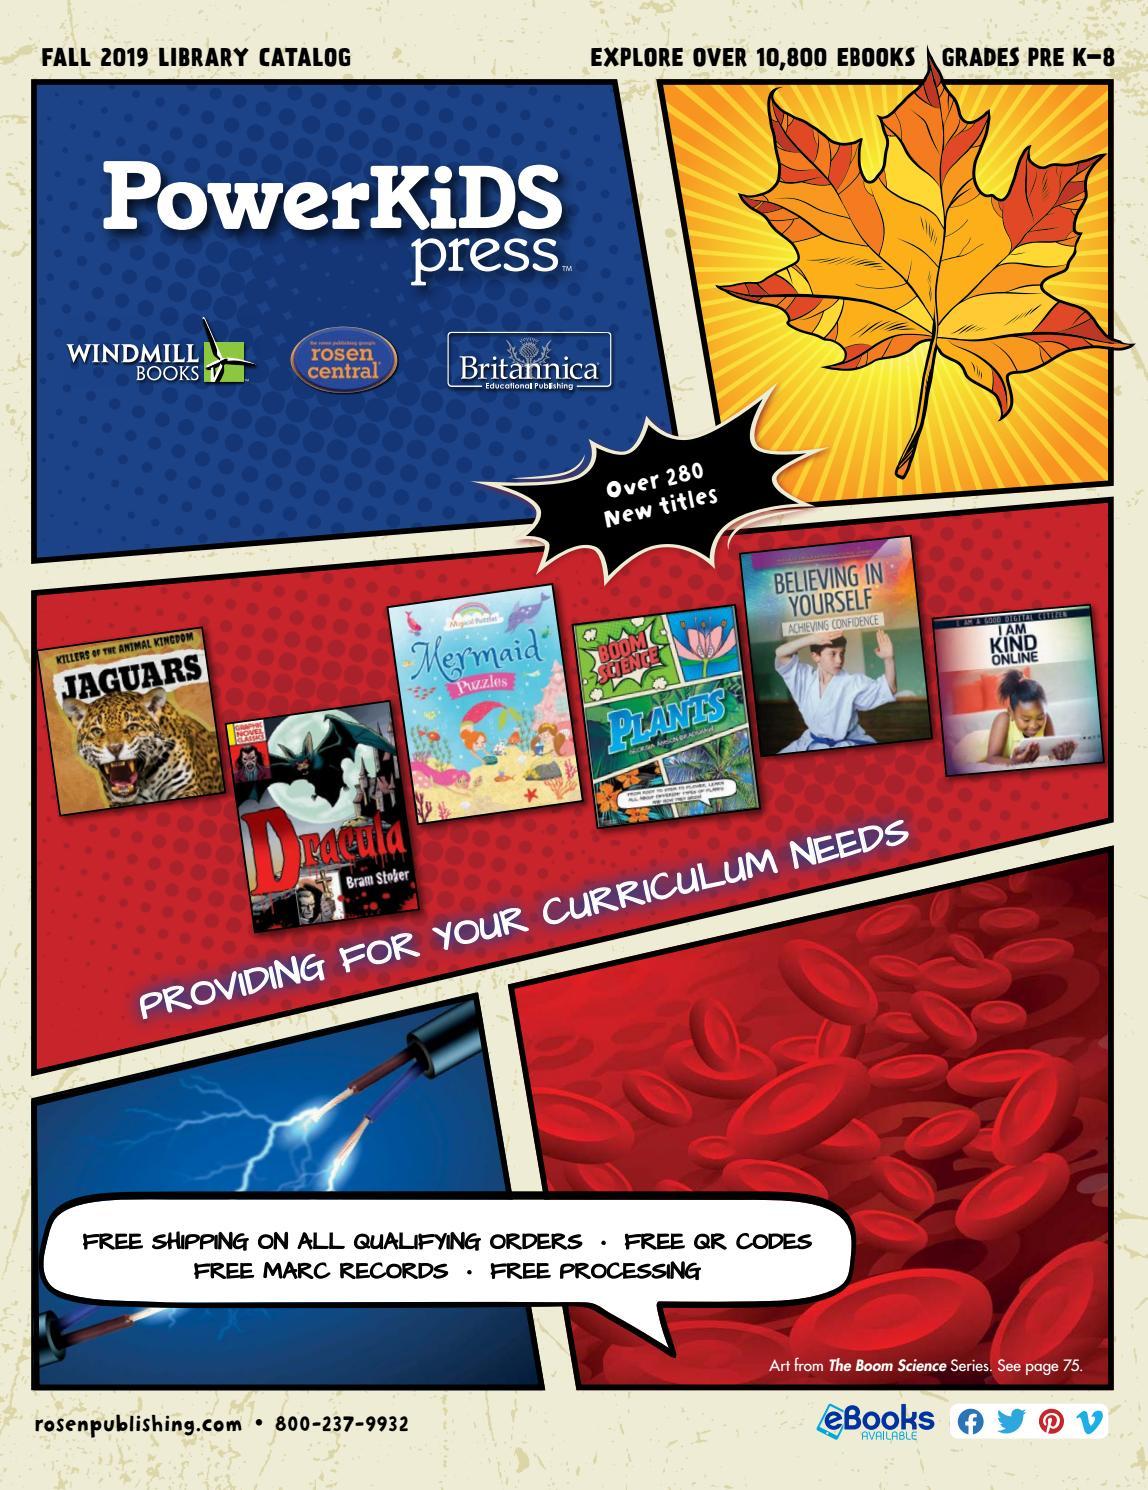 Powerkids Fall 2019 By Rosen Publishing Issuu